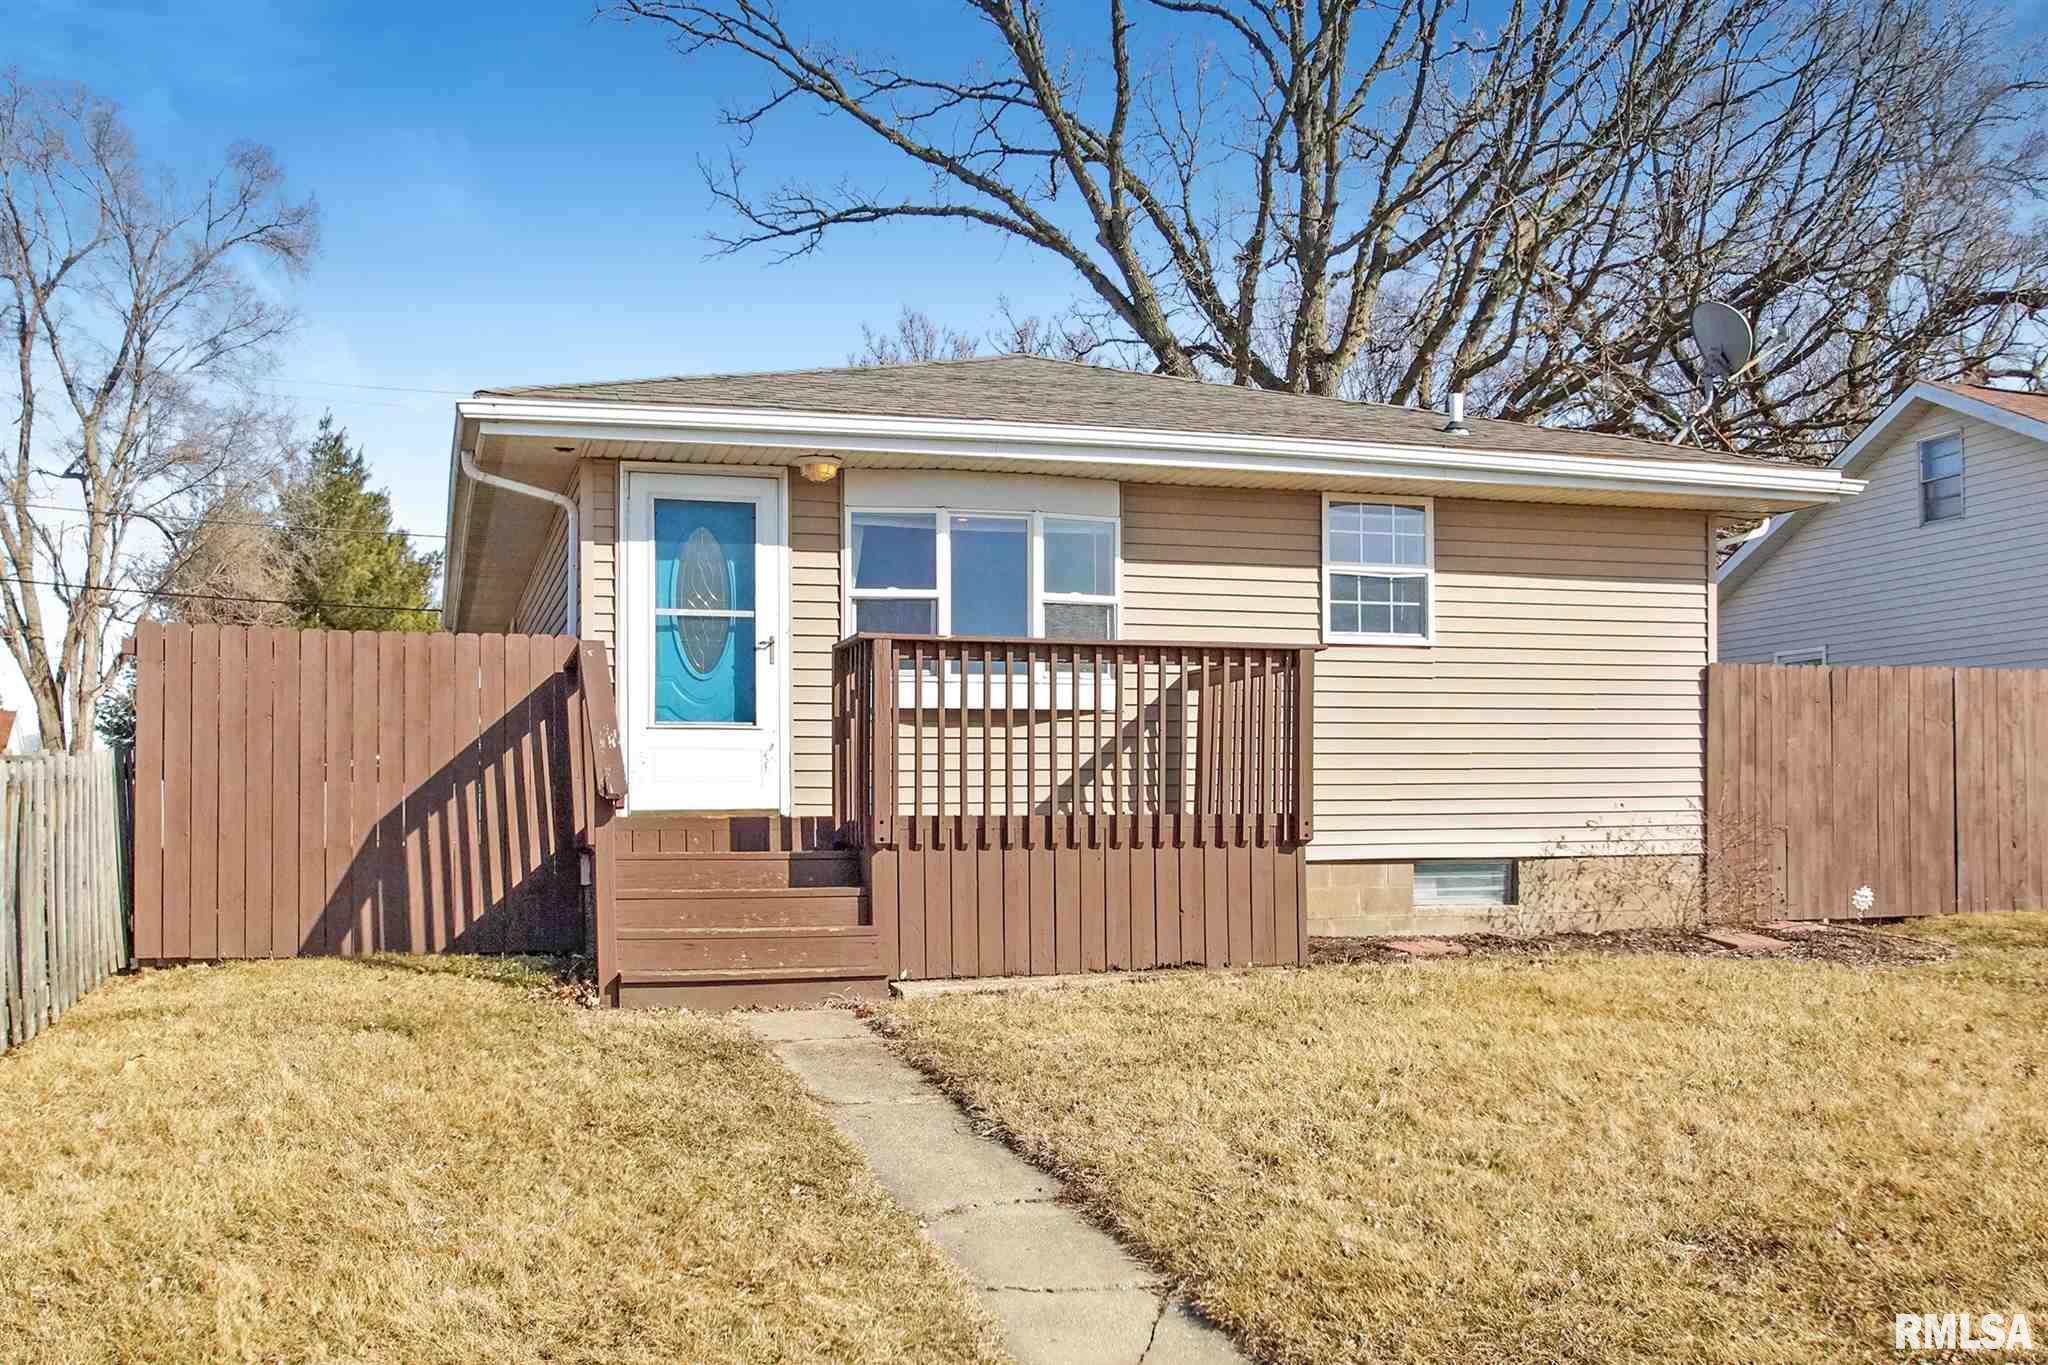 220 N PEKIN Property Photo - Hanna City, IL real estate listing